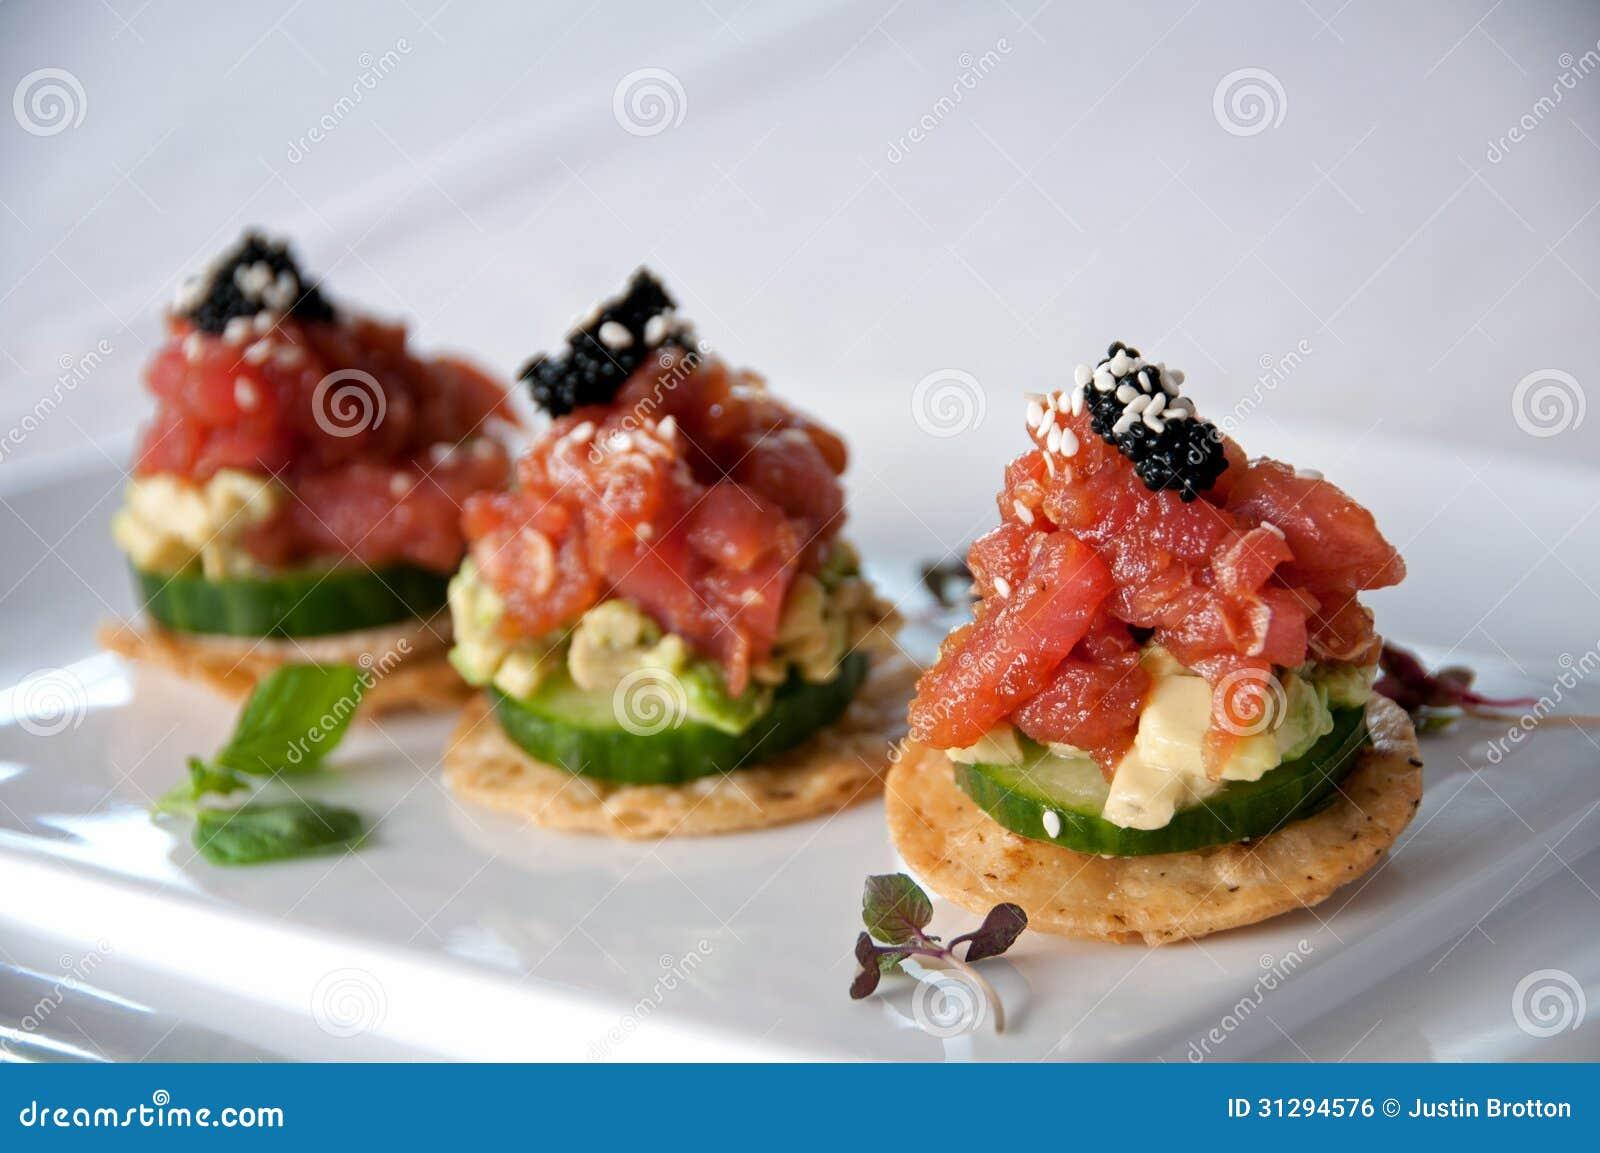 tuna-appetizer-cracker-mustard-caviar-great-31294576.jpg